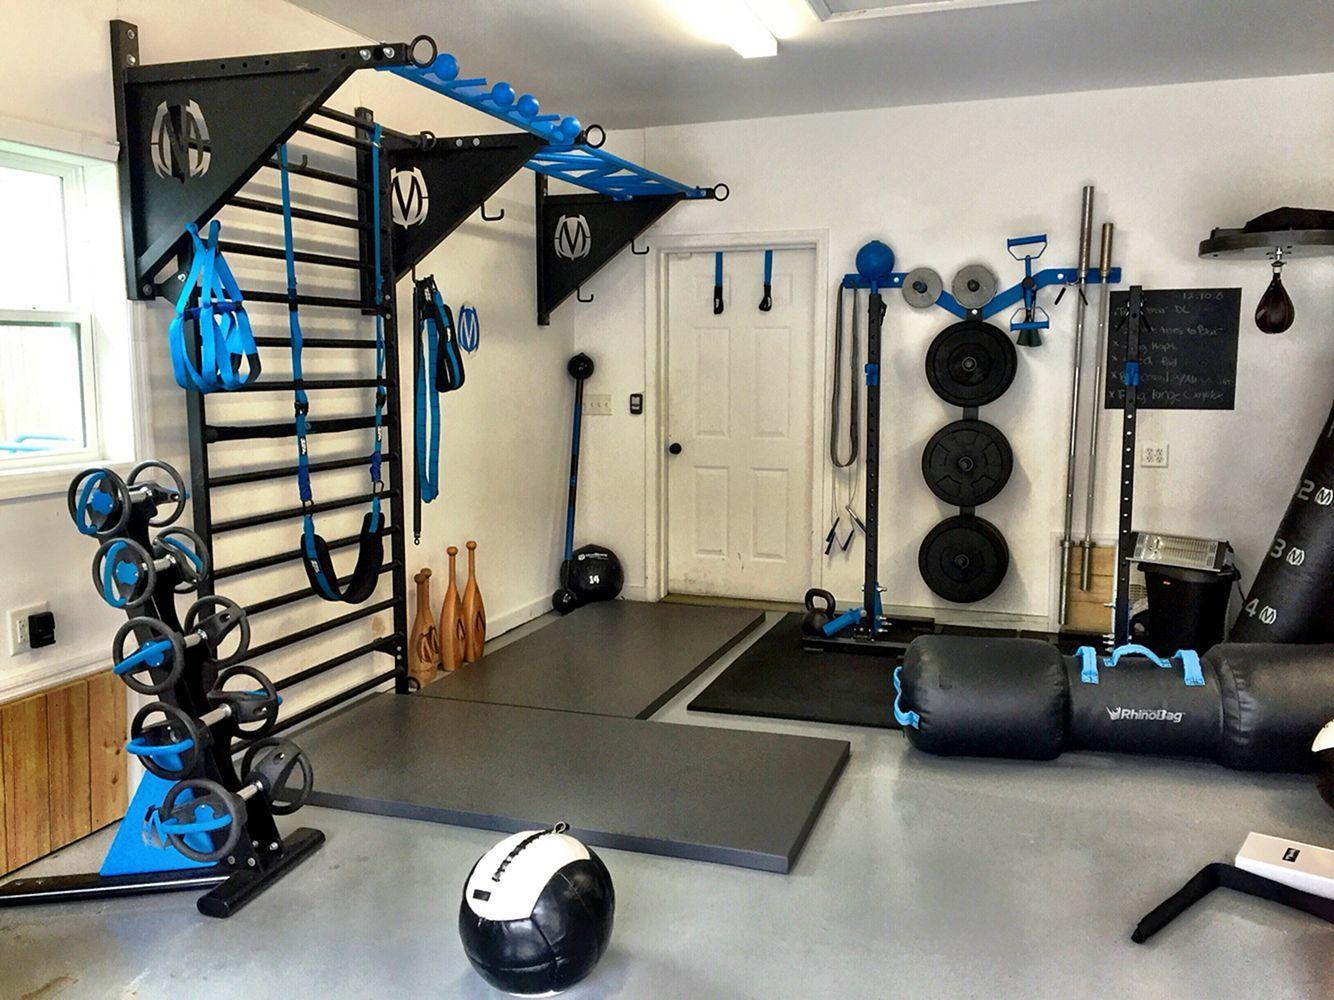 50 Incredible Exercise Home Gym Room You